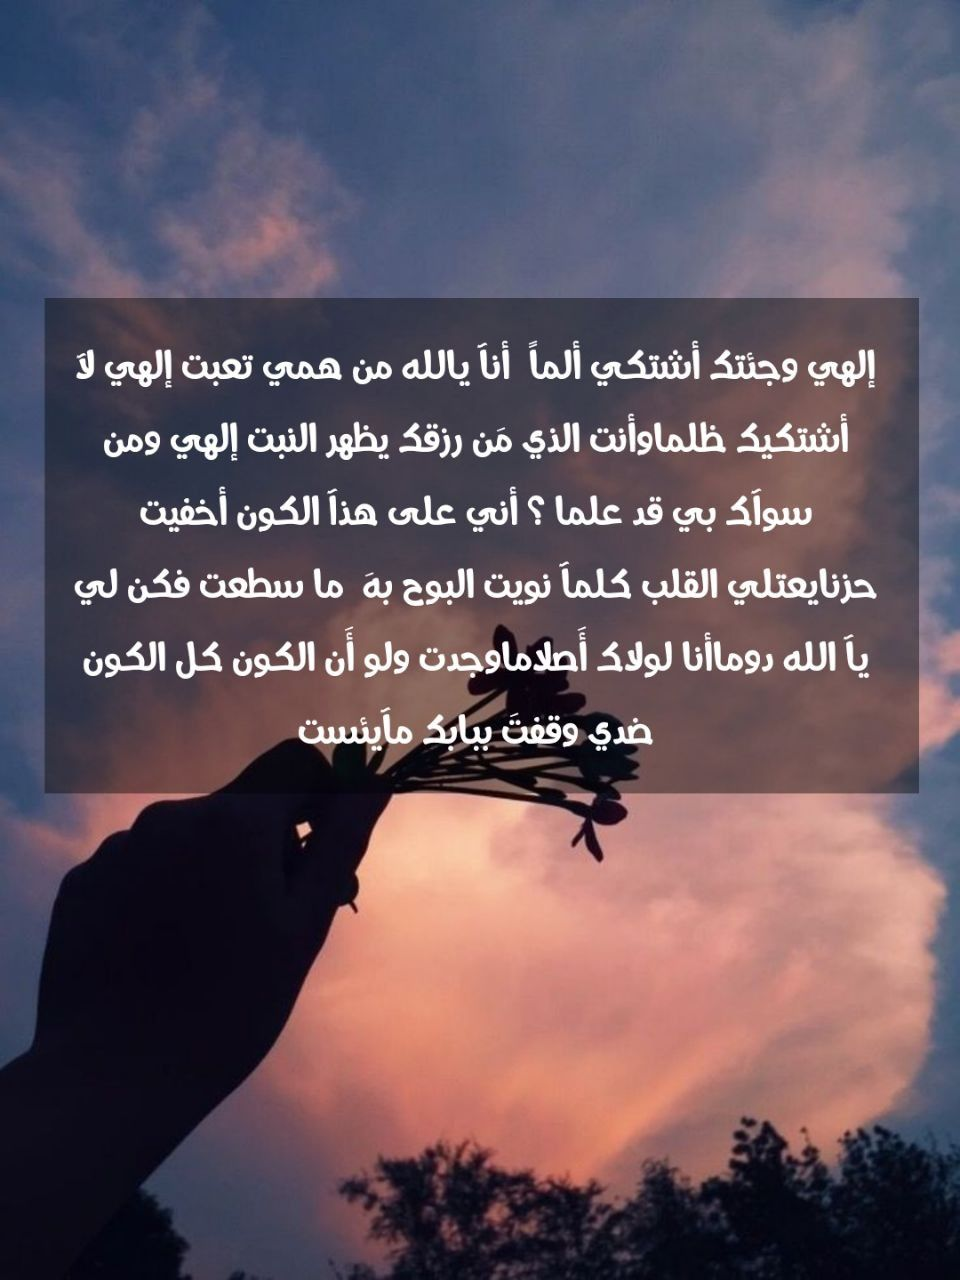 Pin By رحمة عبد الهادي On أجيب دعوة الداعي Movie Posters Lockscreen Screenshot Poster